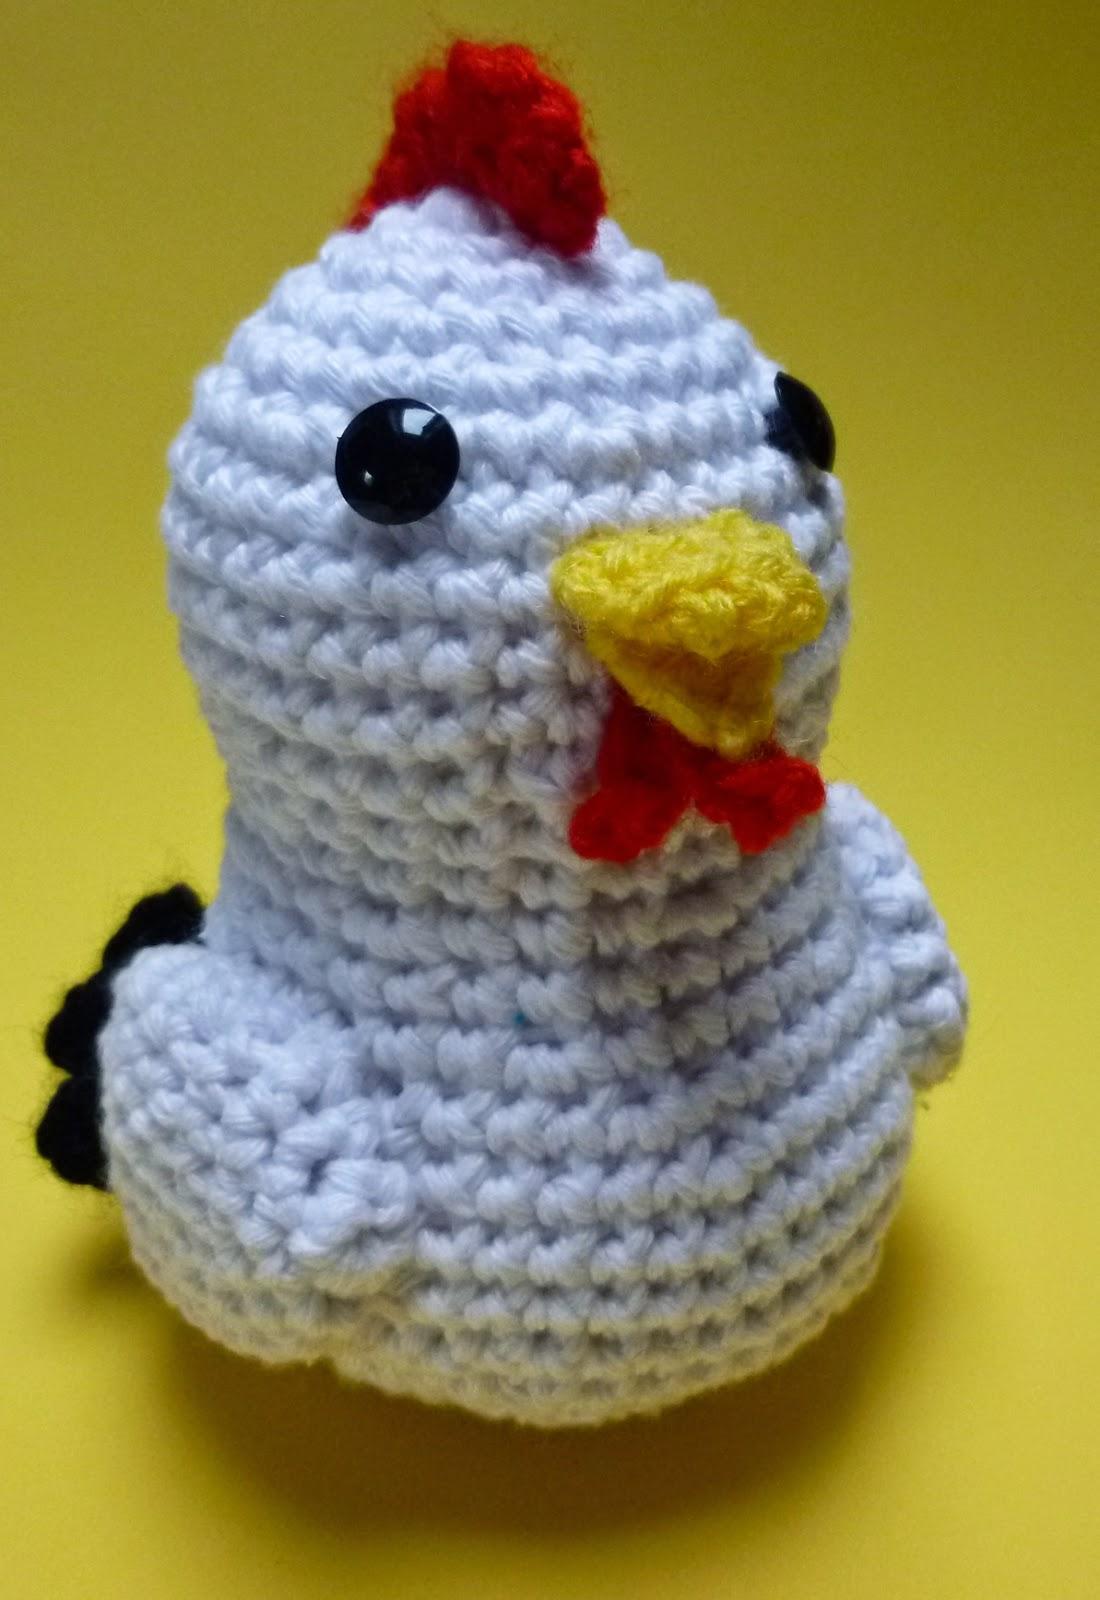 http://sunmoonamigurumi.blogspot.de/2014/05/pattern-amigurumi-chicken.html